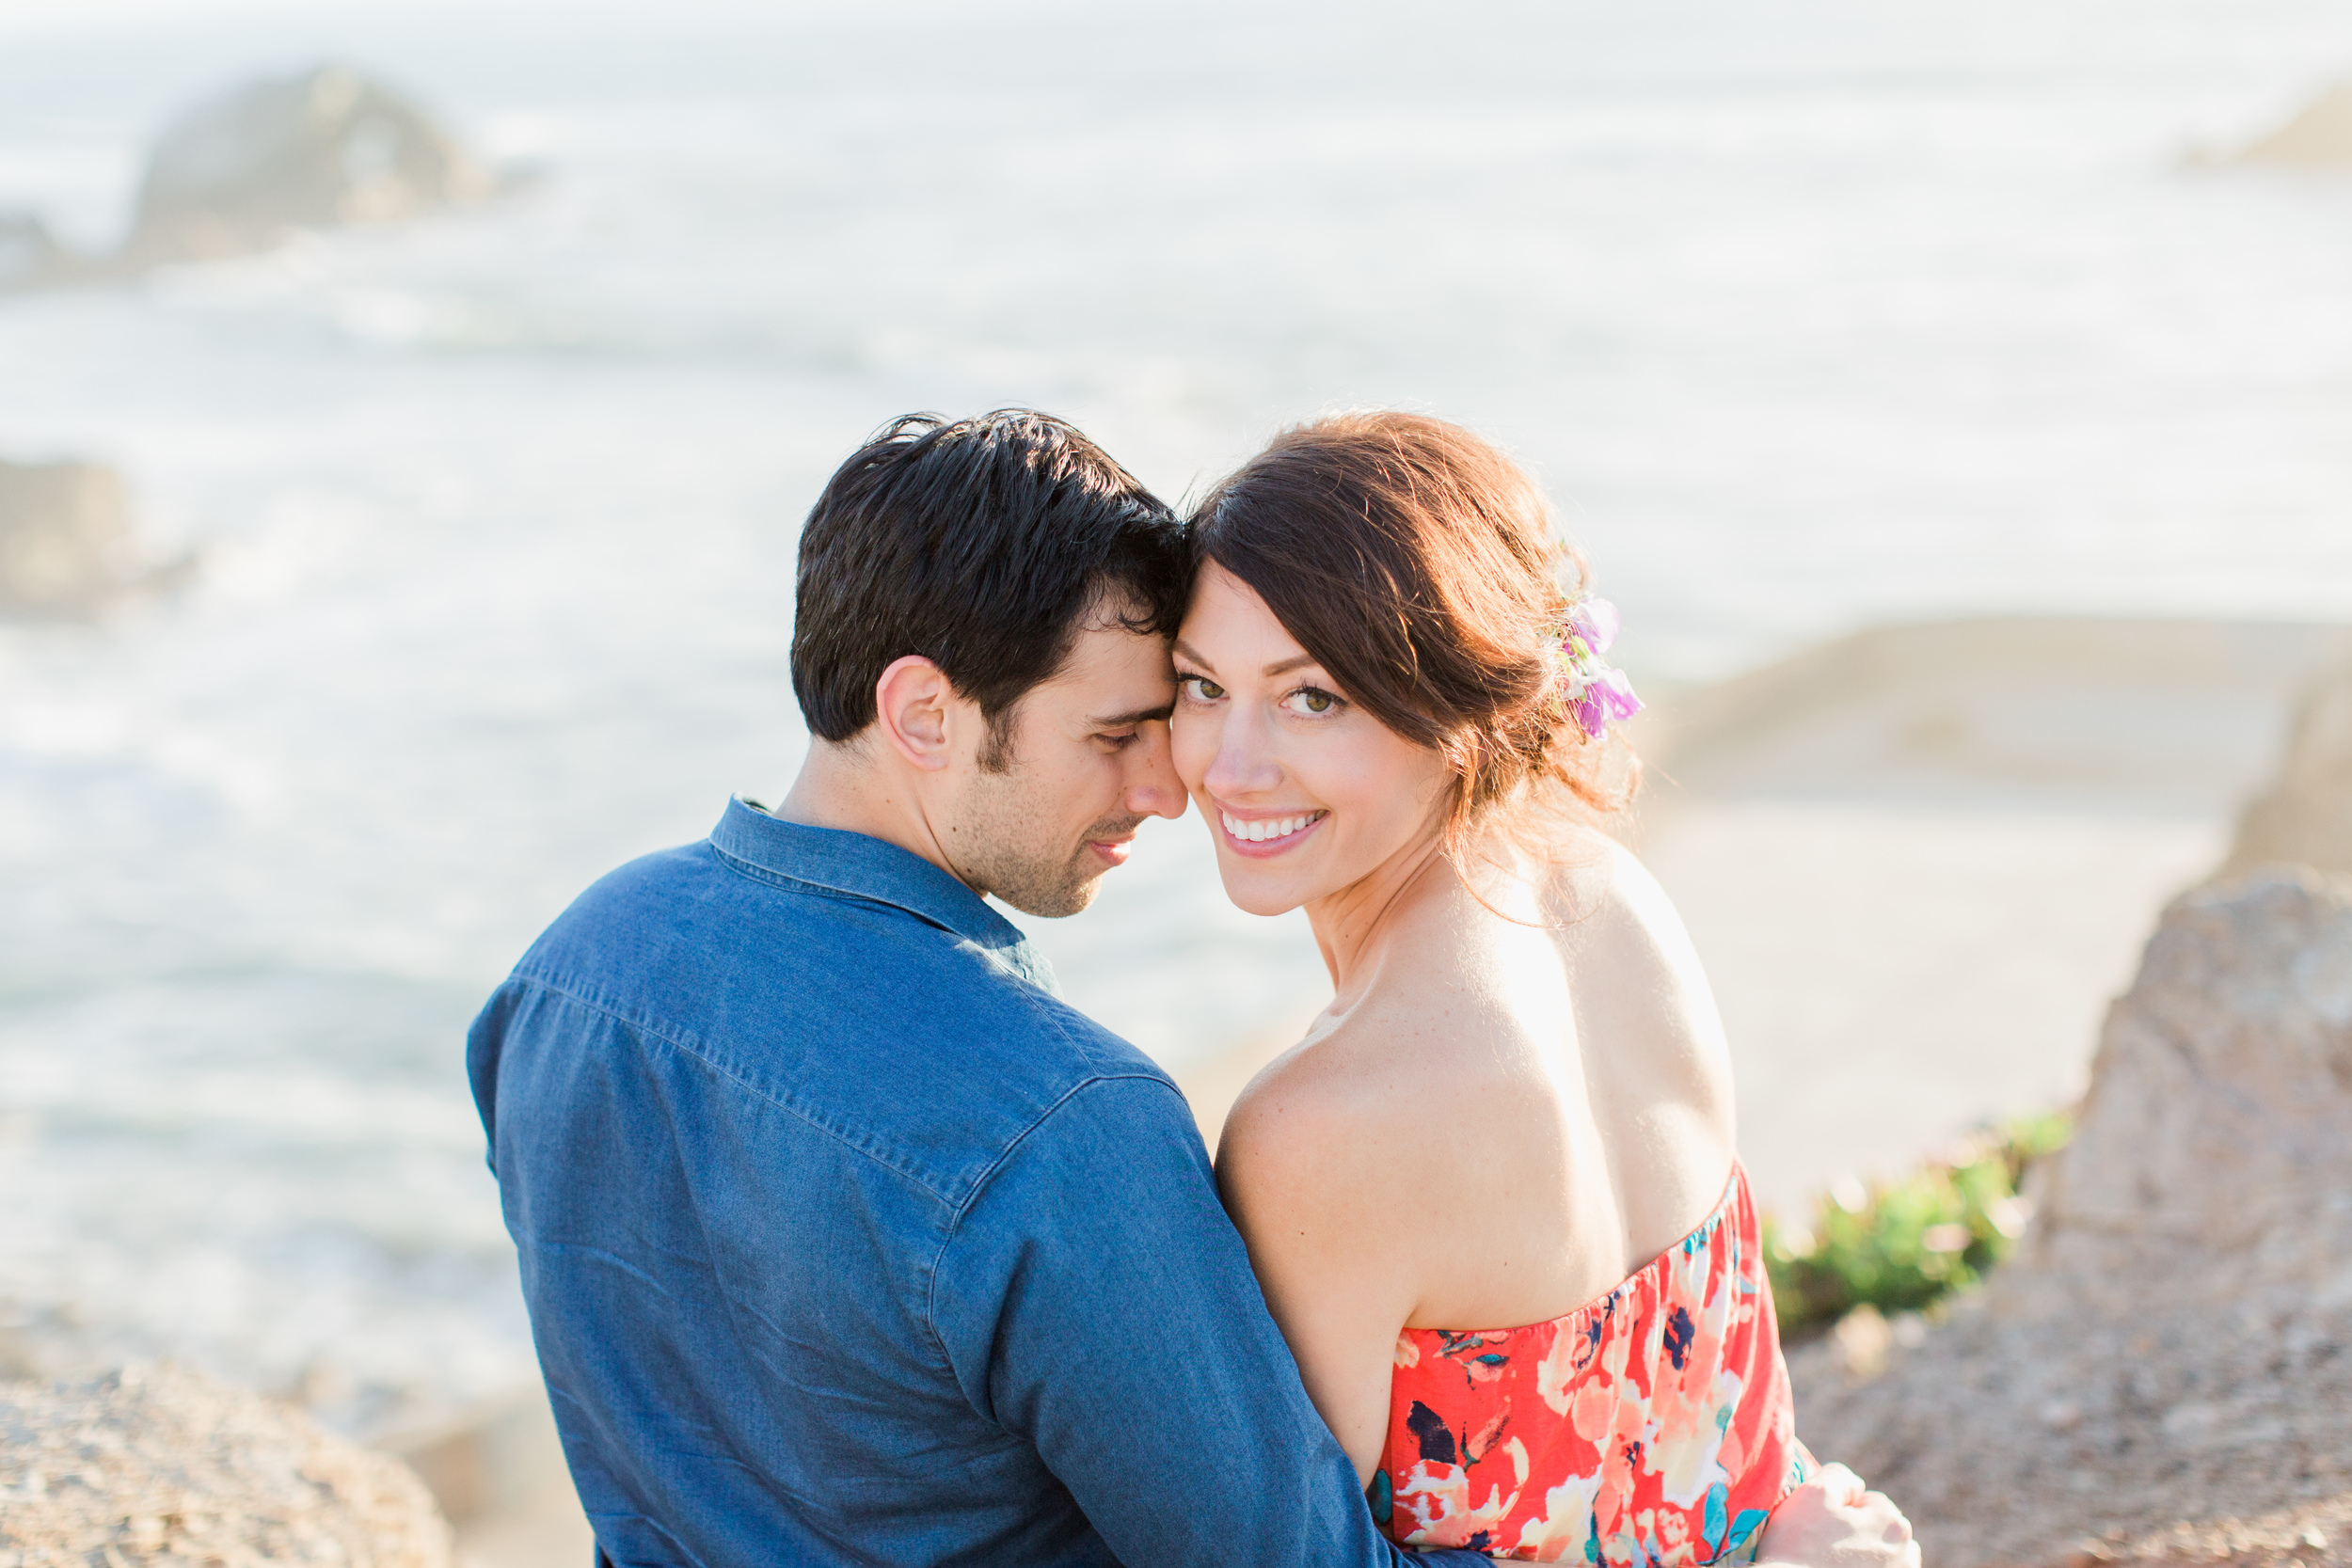 San-Francisco-hybrid-wedding-photographer-25.jpg